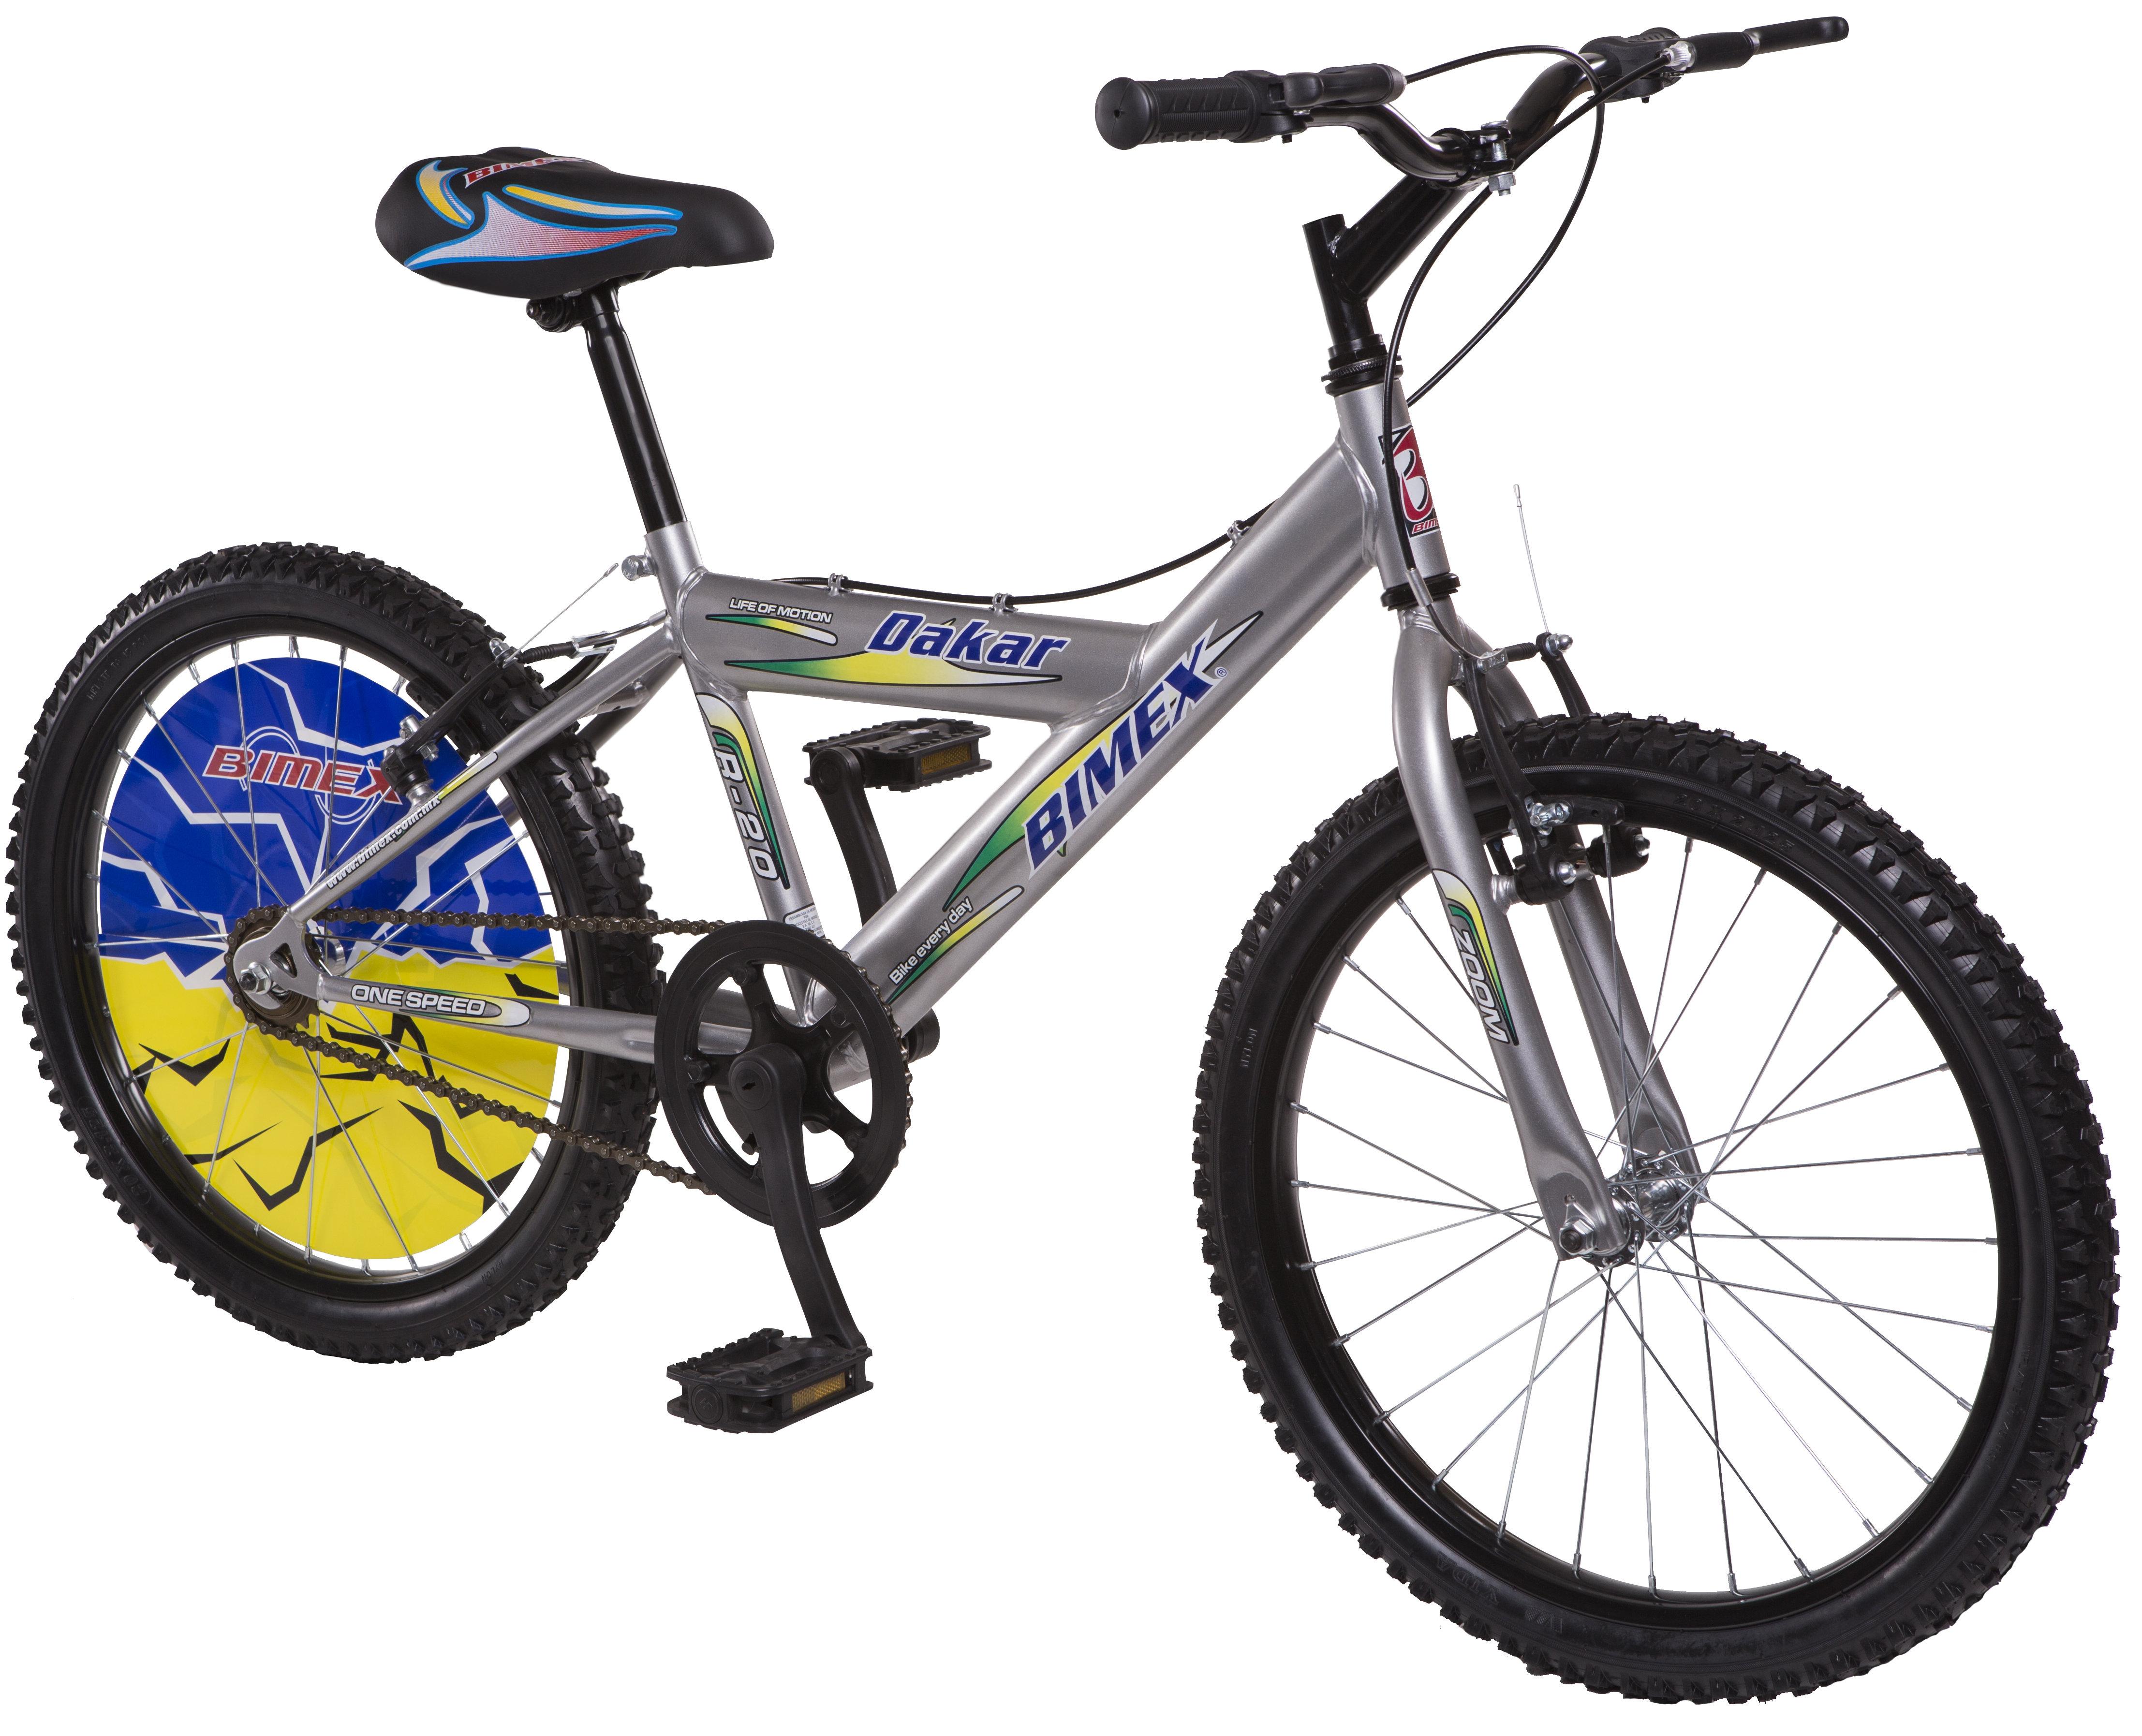 Bicicleta Dakar r20 Bimex